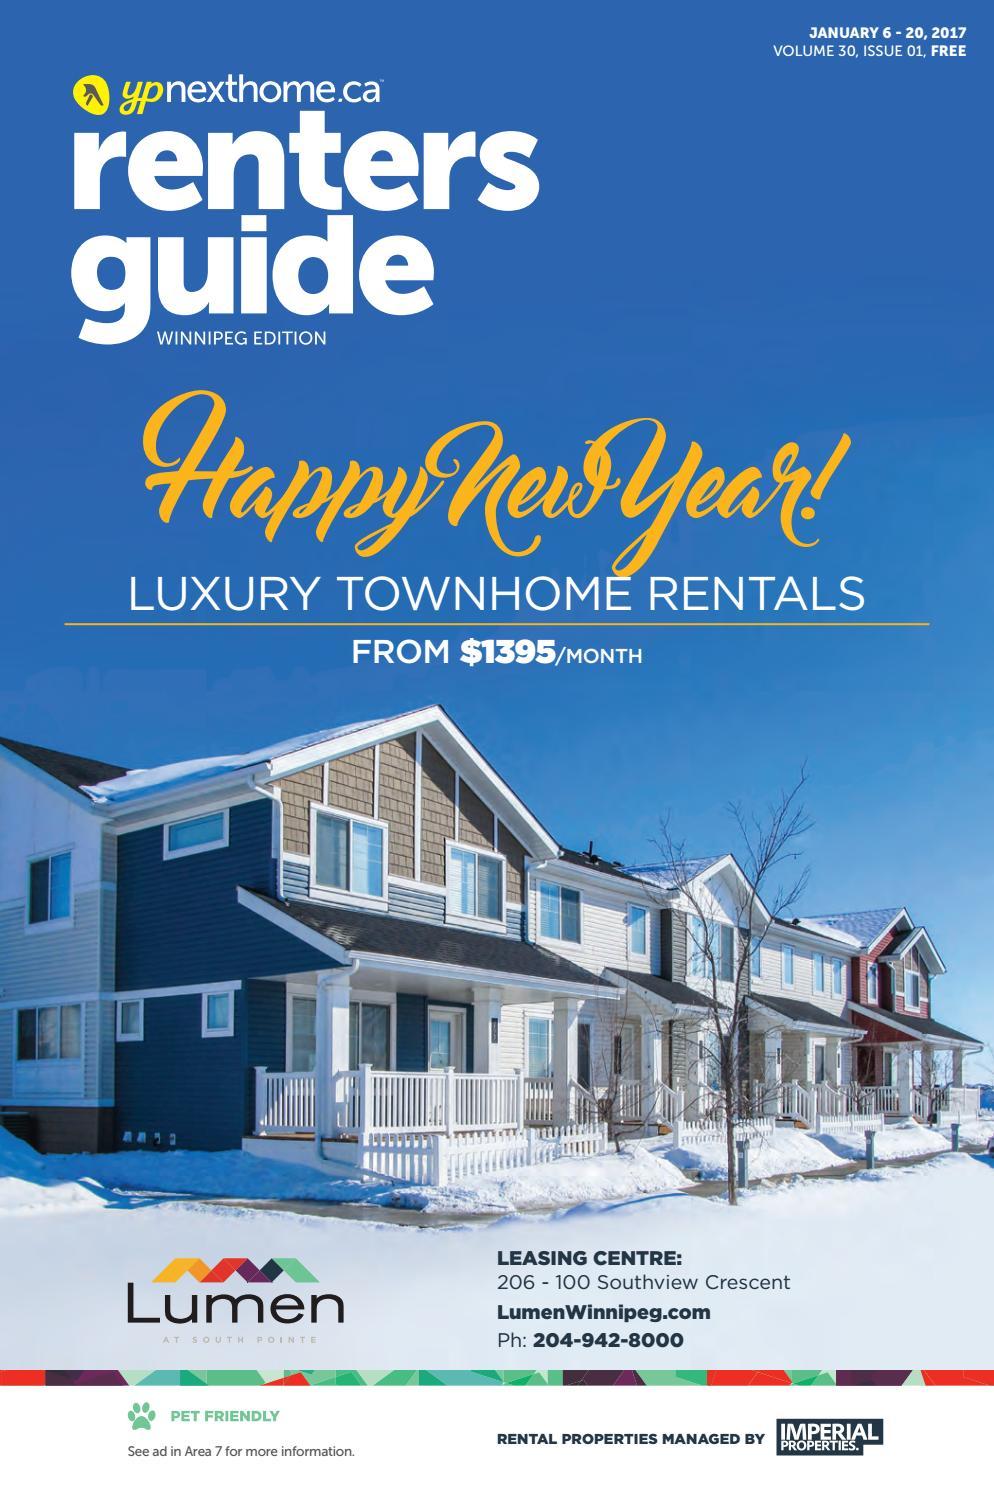 WINNIPEG Renters Guide - 06 Jan, 2017 by NextHome - issuu